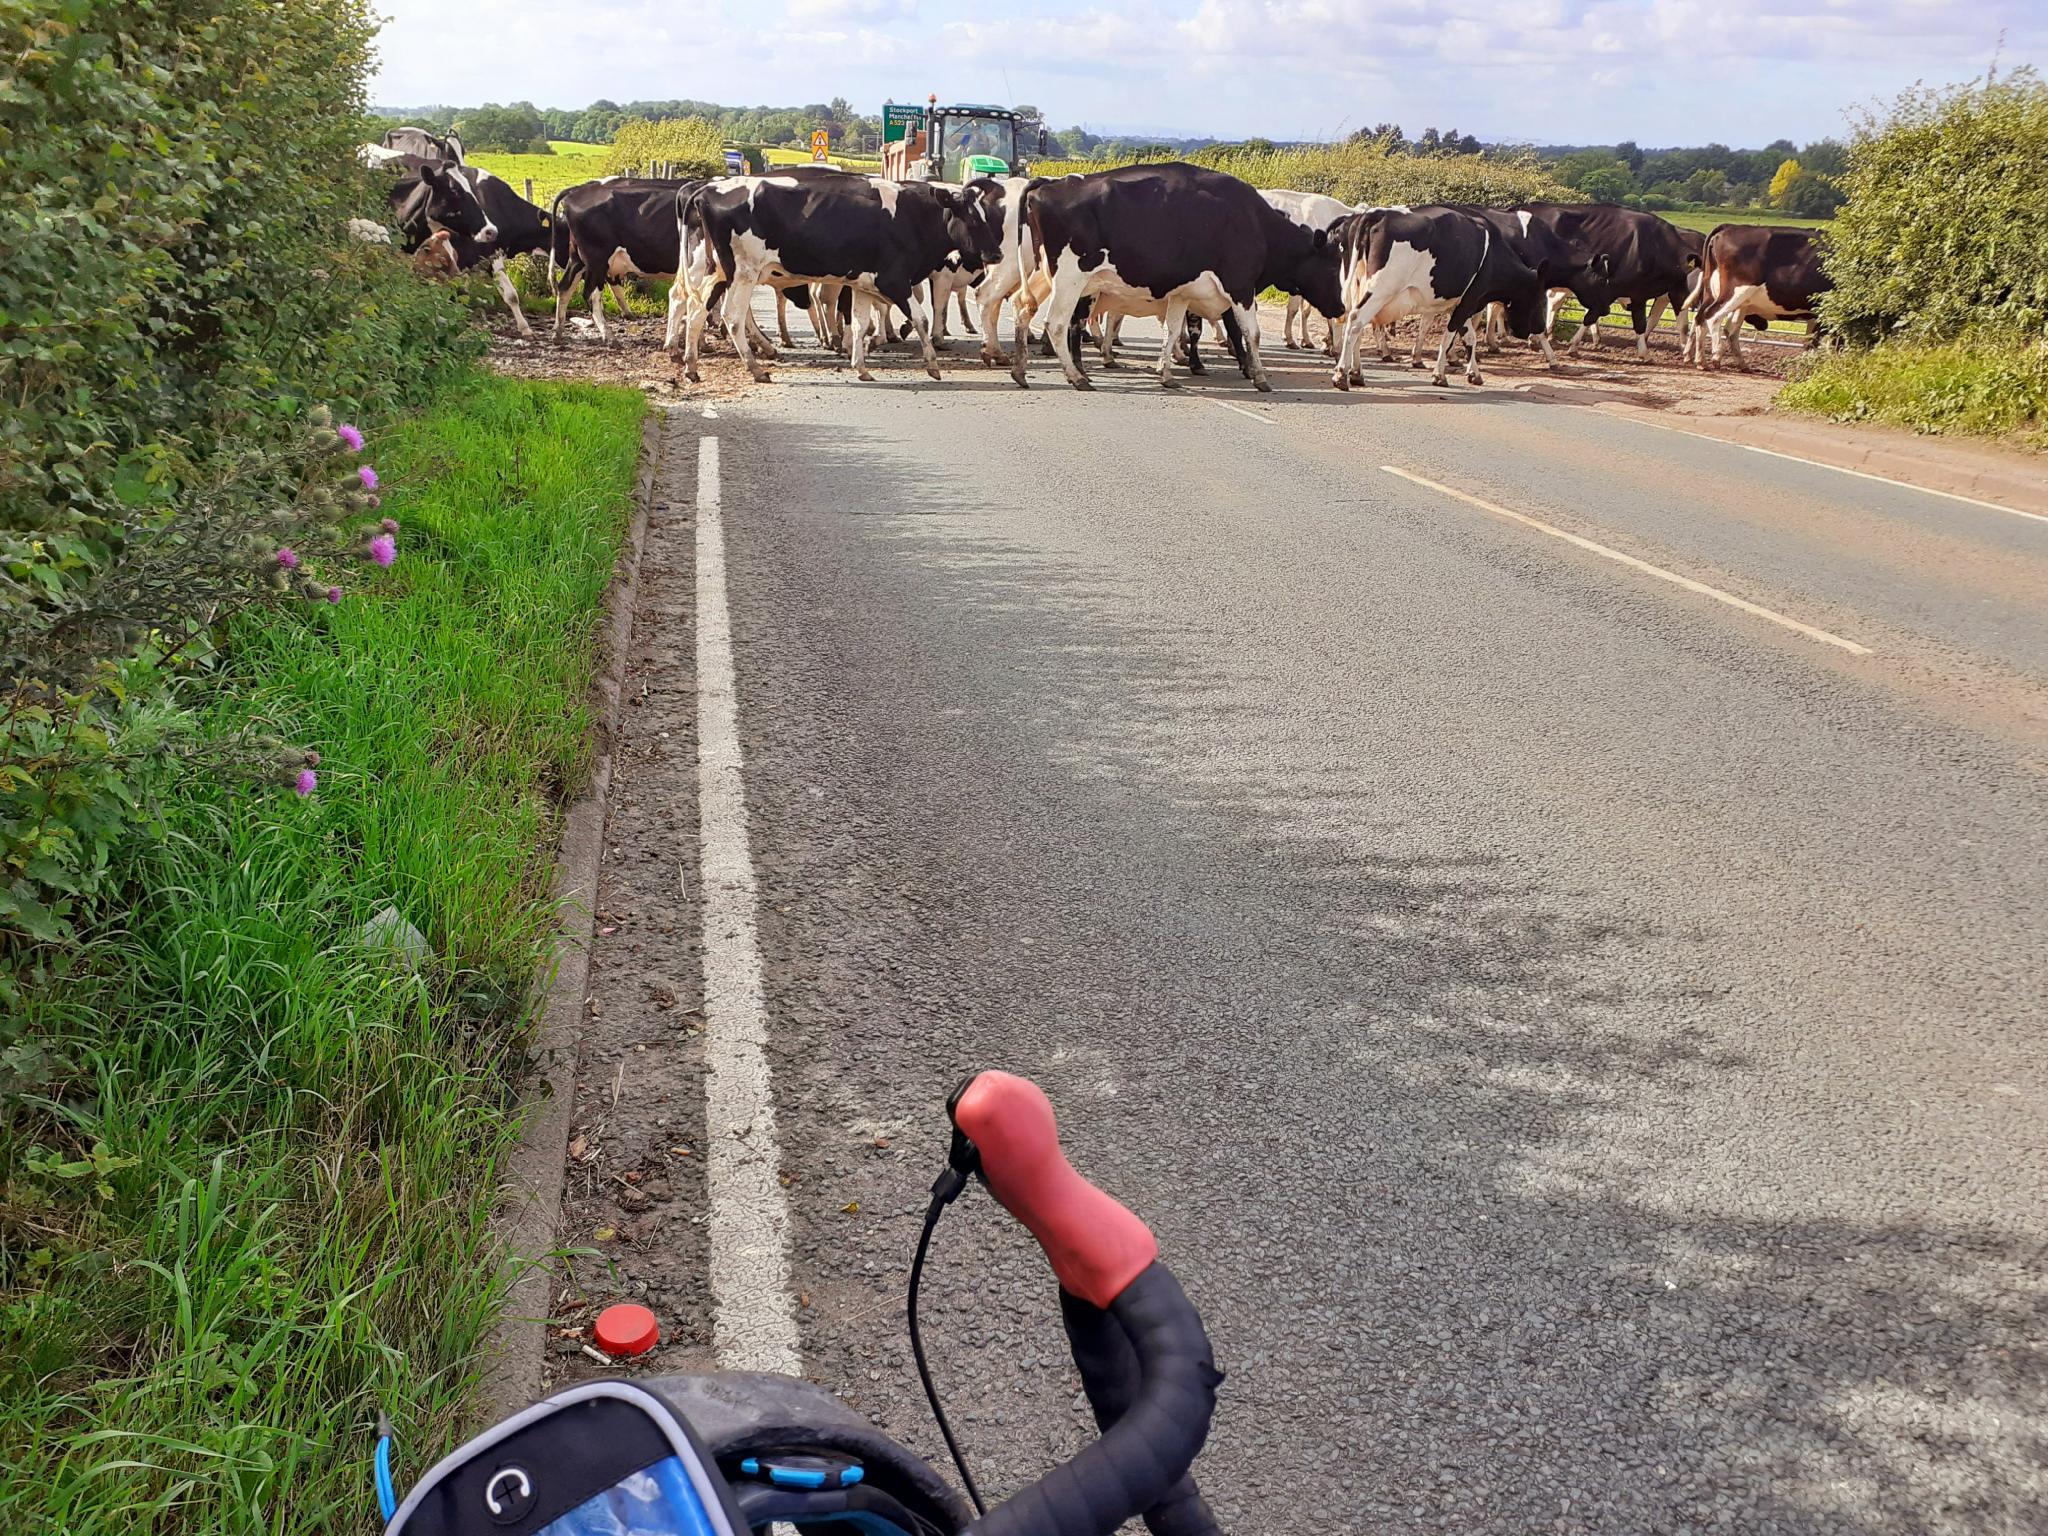 On my bike-20200706_220942-jpg